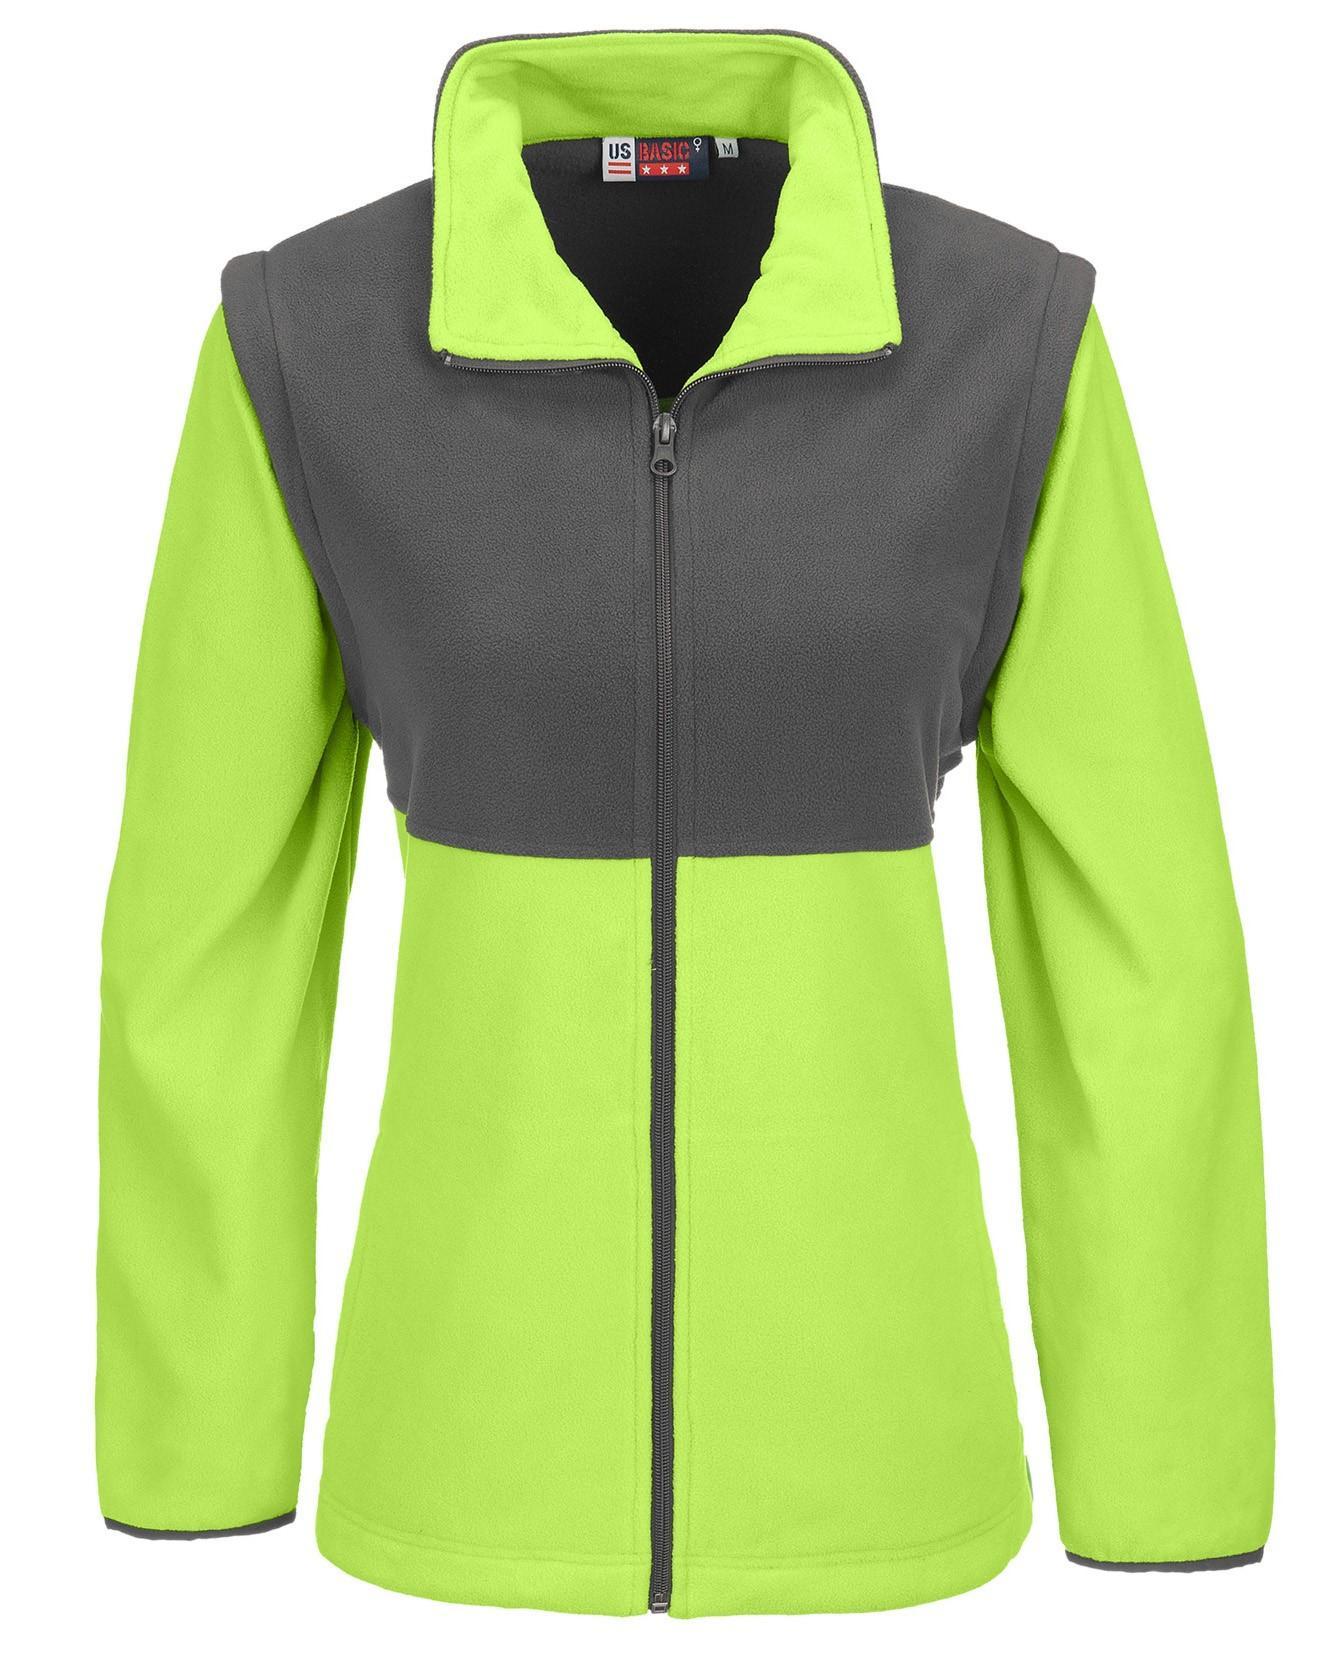 Ladies Benneton Zip-off Micro Fleece Jacket - Lime Only